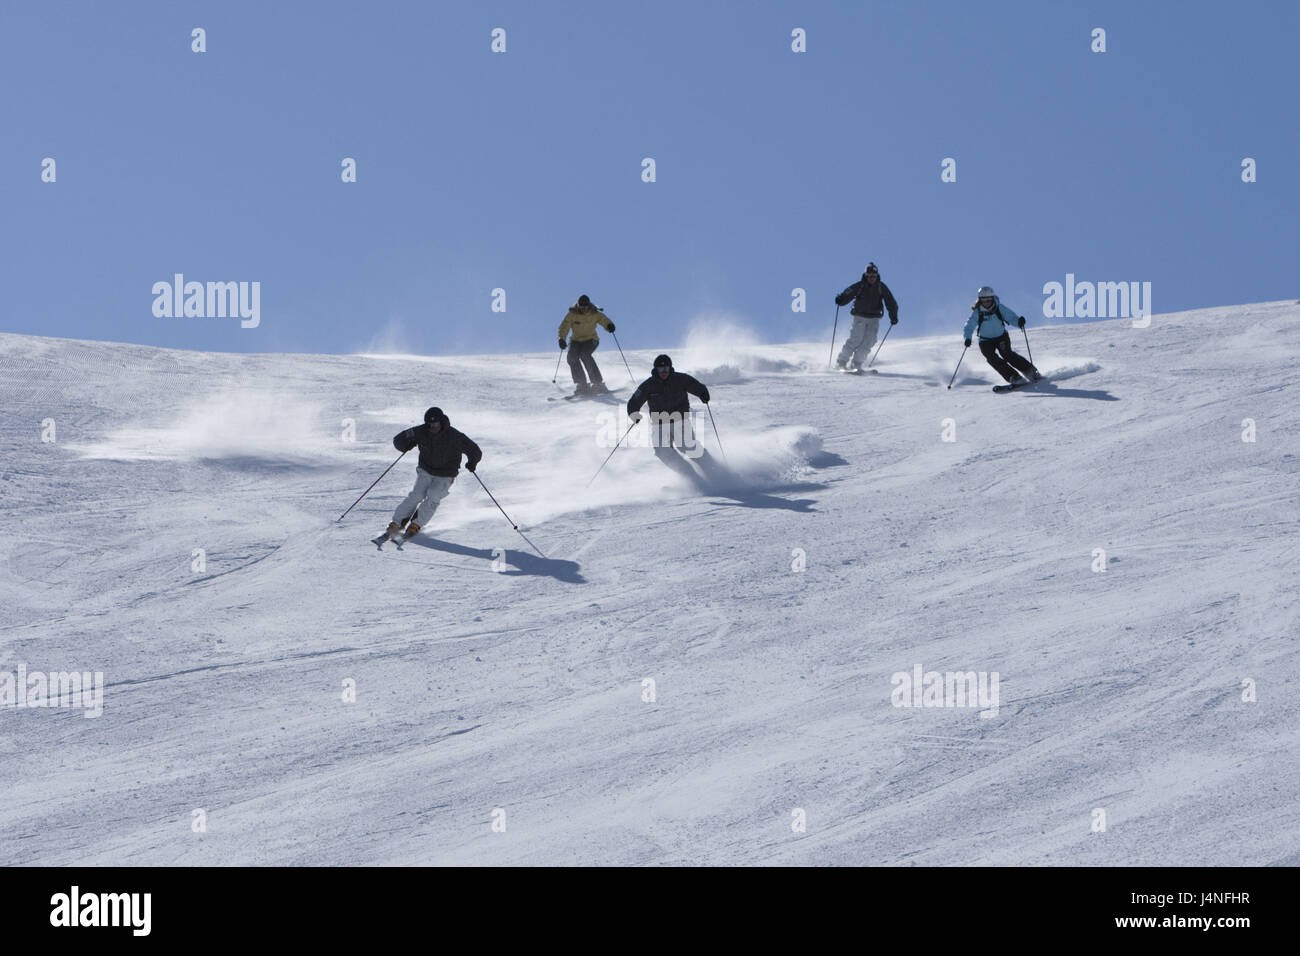 Switzerland, the Engadine, Bernina group, Diavolezza, skiing area, runway, skier, five, - Stock Image